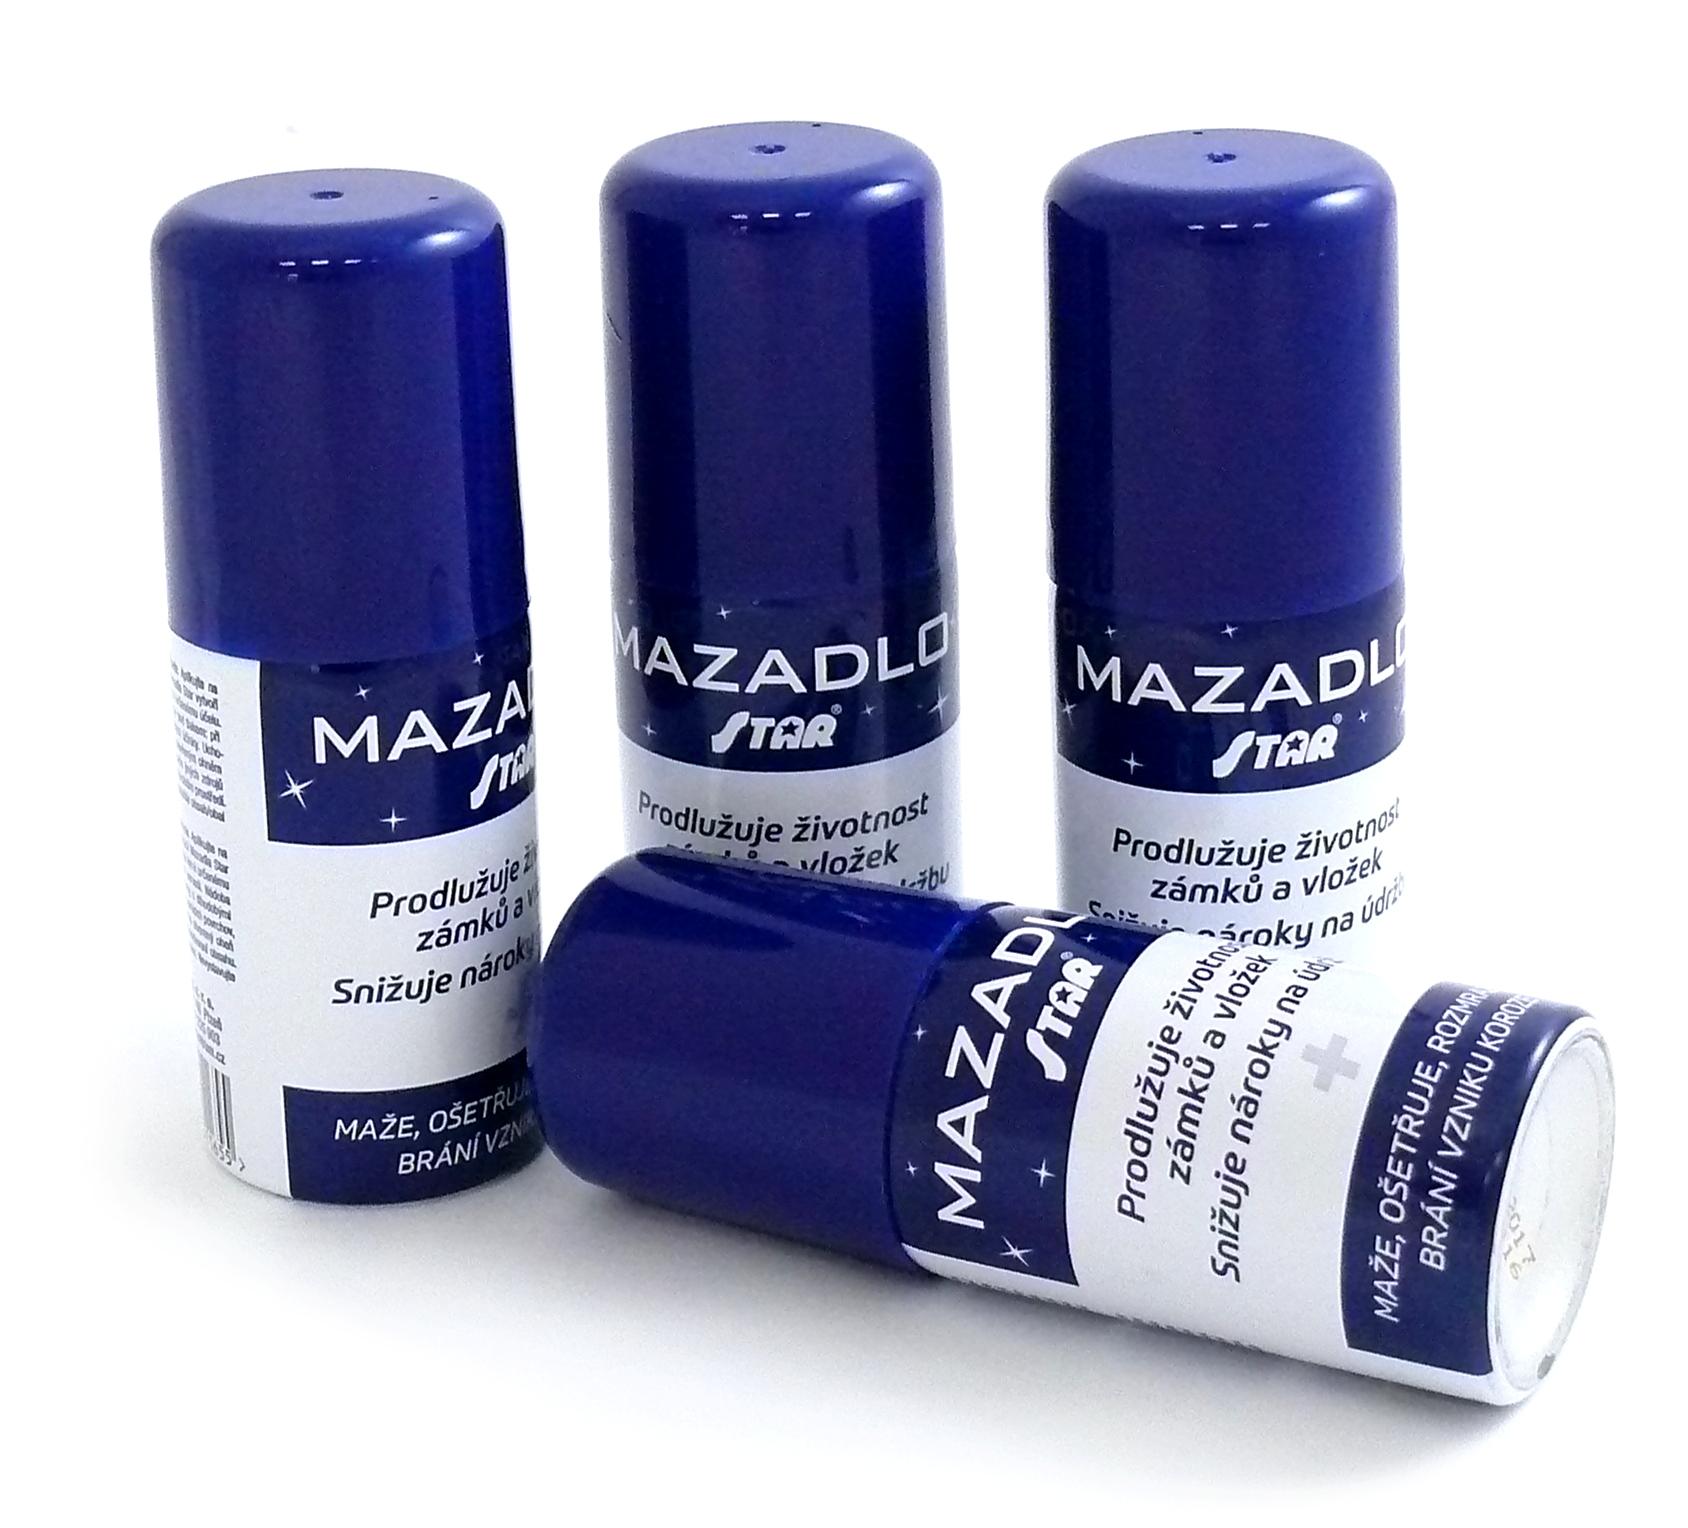 Mazadla STAR